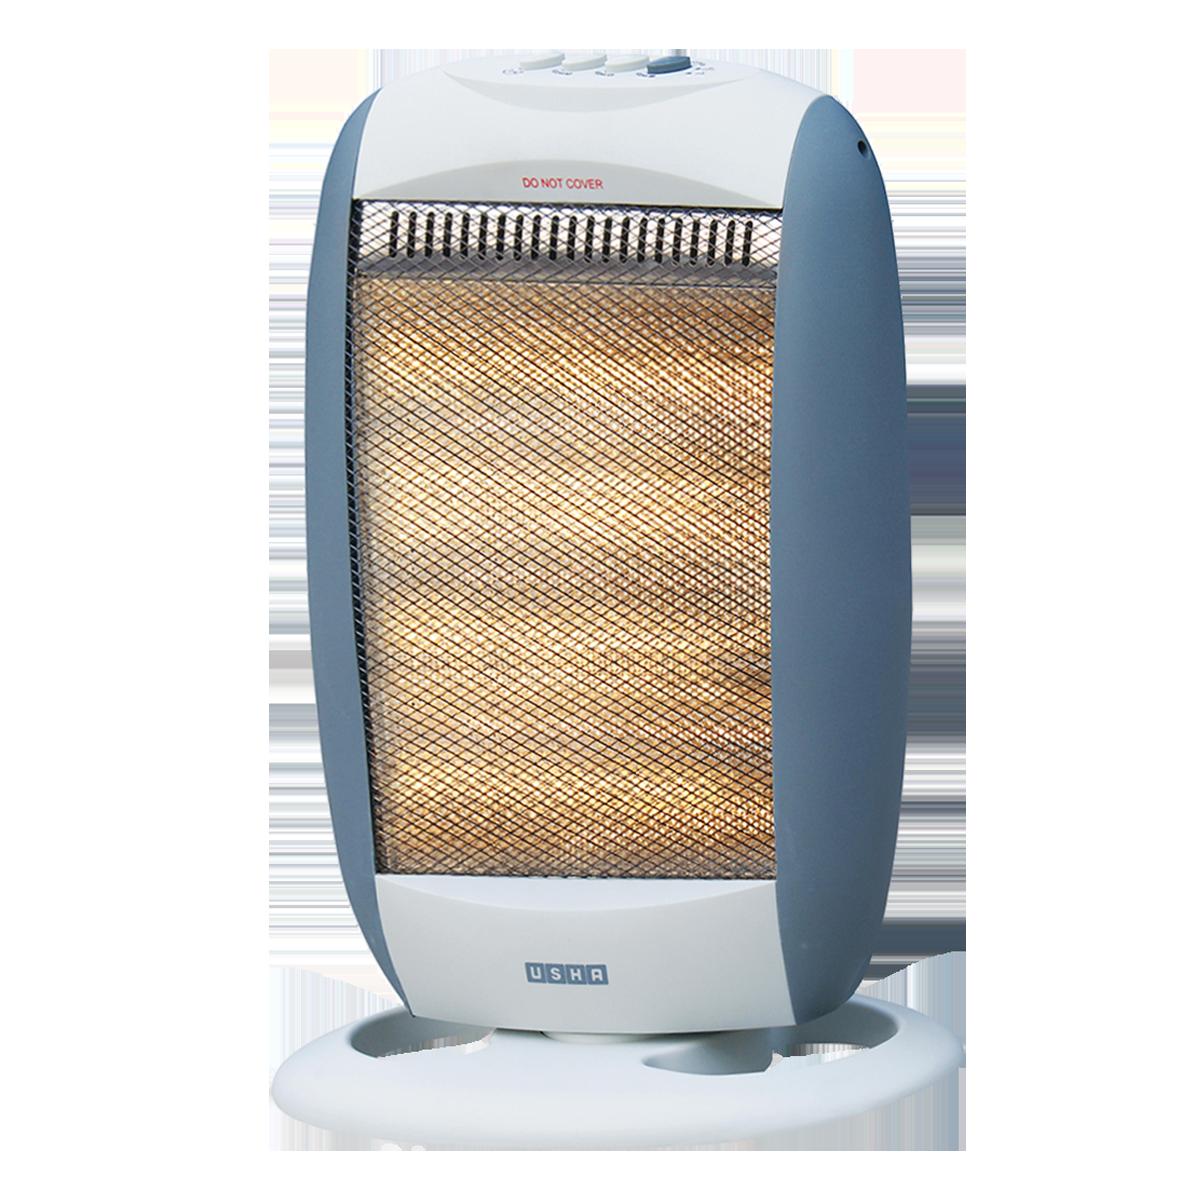 Usha 1200 Watts Halogen Room Heater (Automatic Oscillation, HH3303, Silver)_1